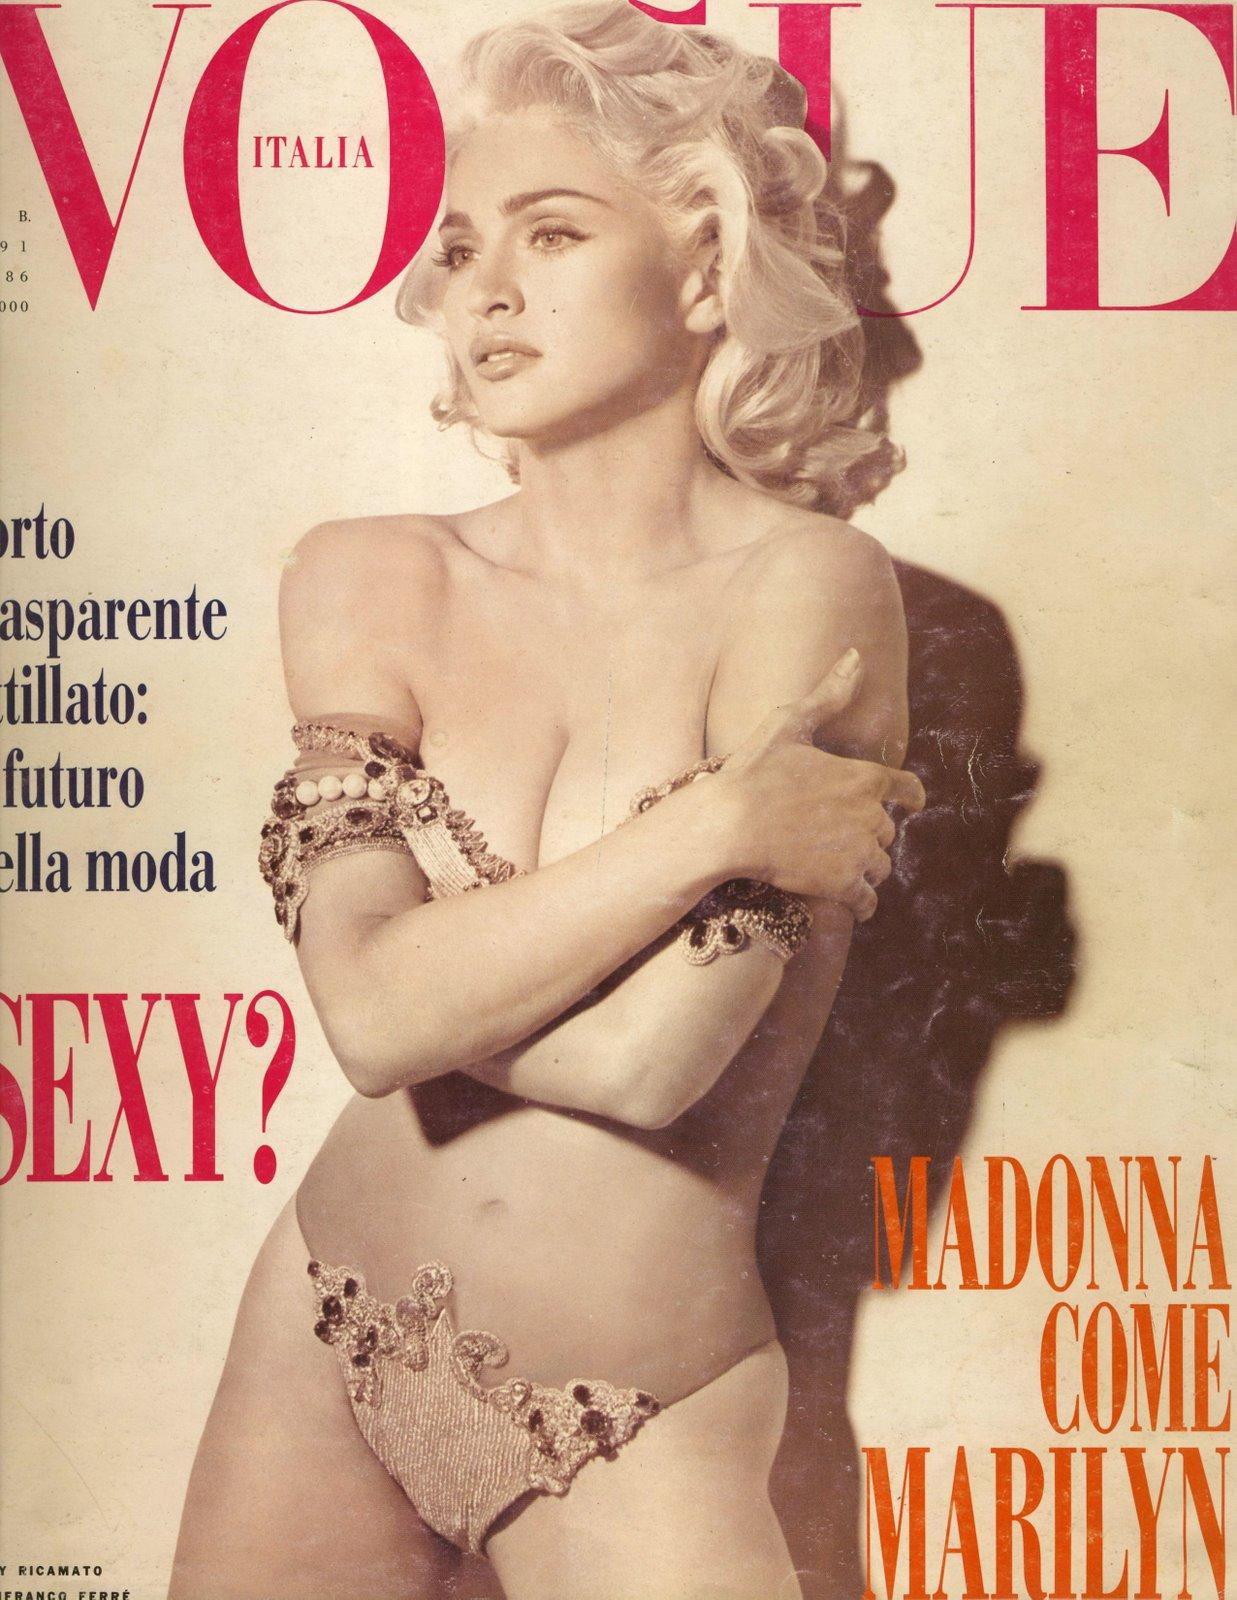 http://1.bp.blogspot.com/_38T64sfKt3Y/SgX2pZEcSII/AAAAAAAAEYU/Ul5ZvPTBEP4/s1600/italian_vogue_madonna_meisel_Scan10116.jpg